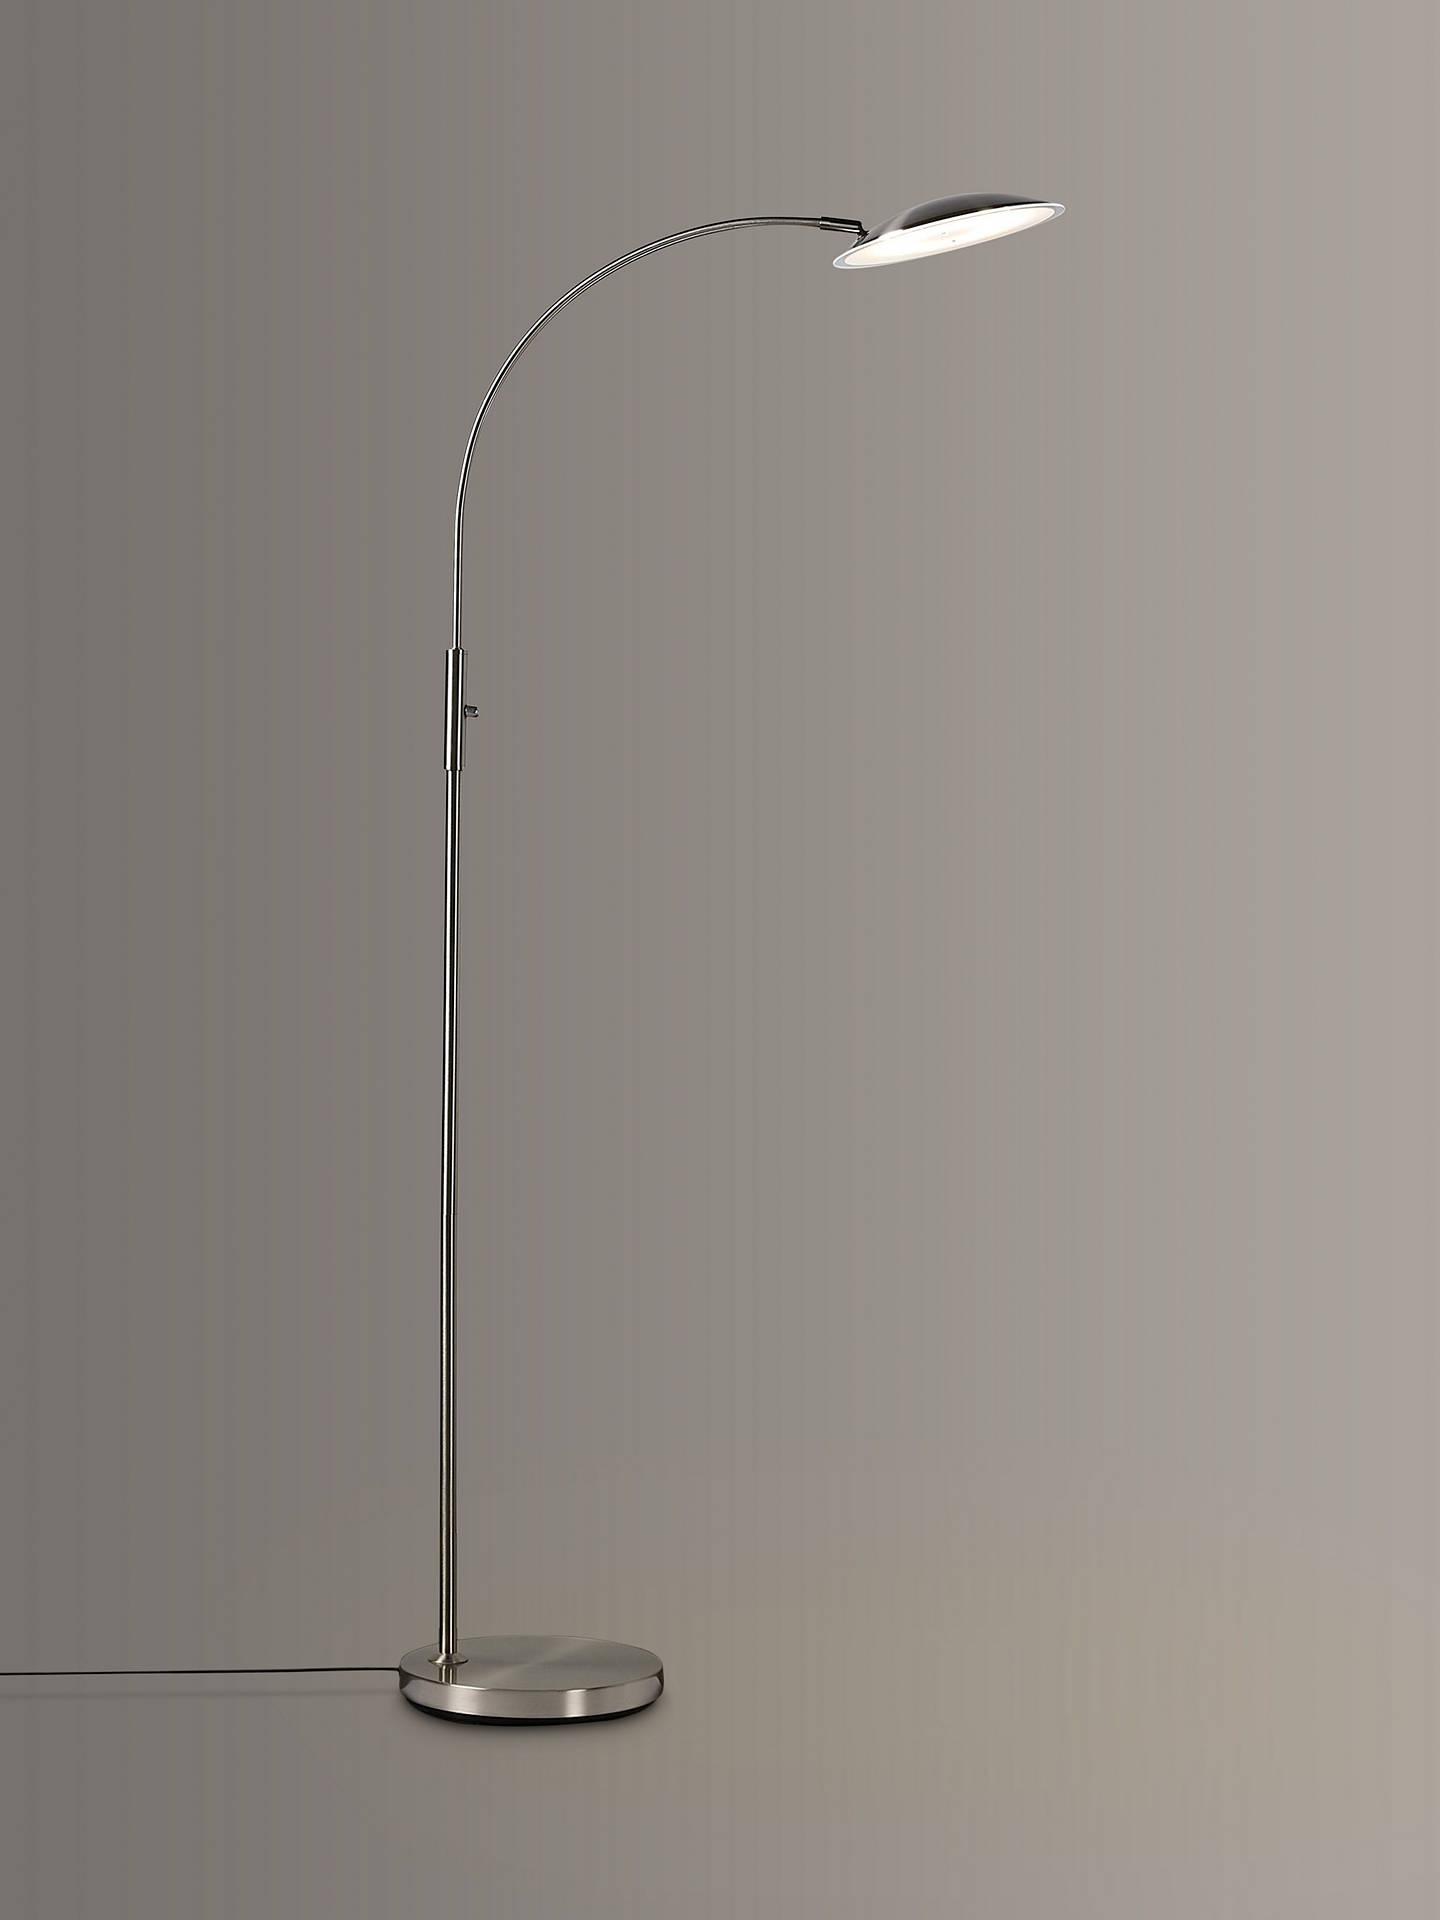 lowest price f676a 79dab John Lewis & Partners Alistair LED Floor Lamp, Satin Nickel